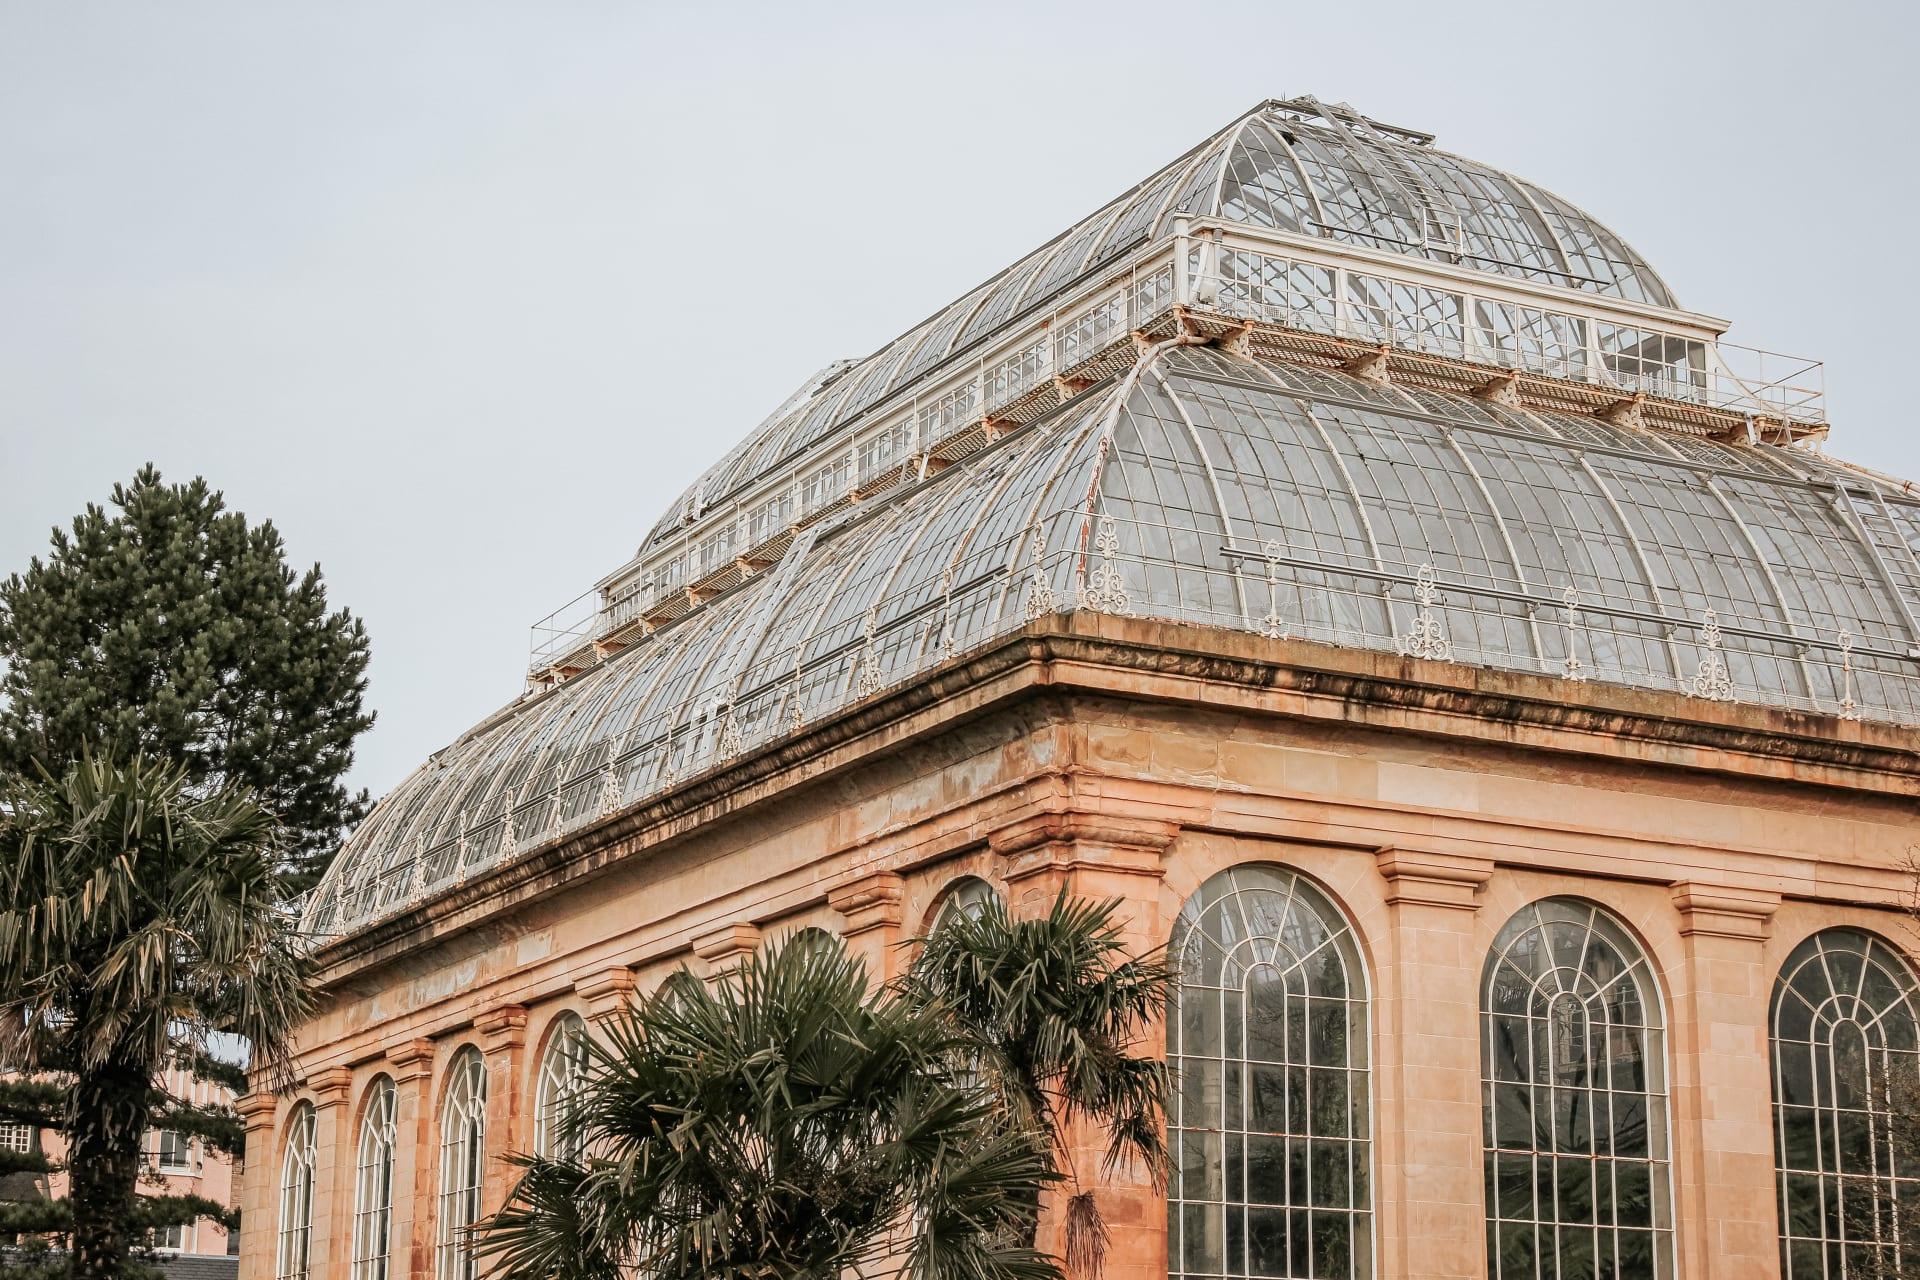 Edinburgh - Edinburgh Royal Botanic Garden with Invisible Cities